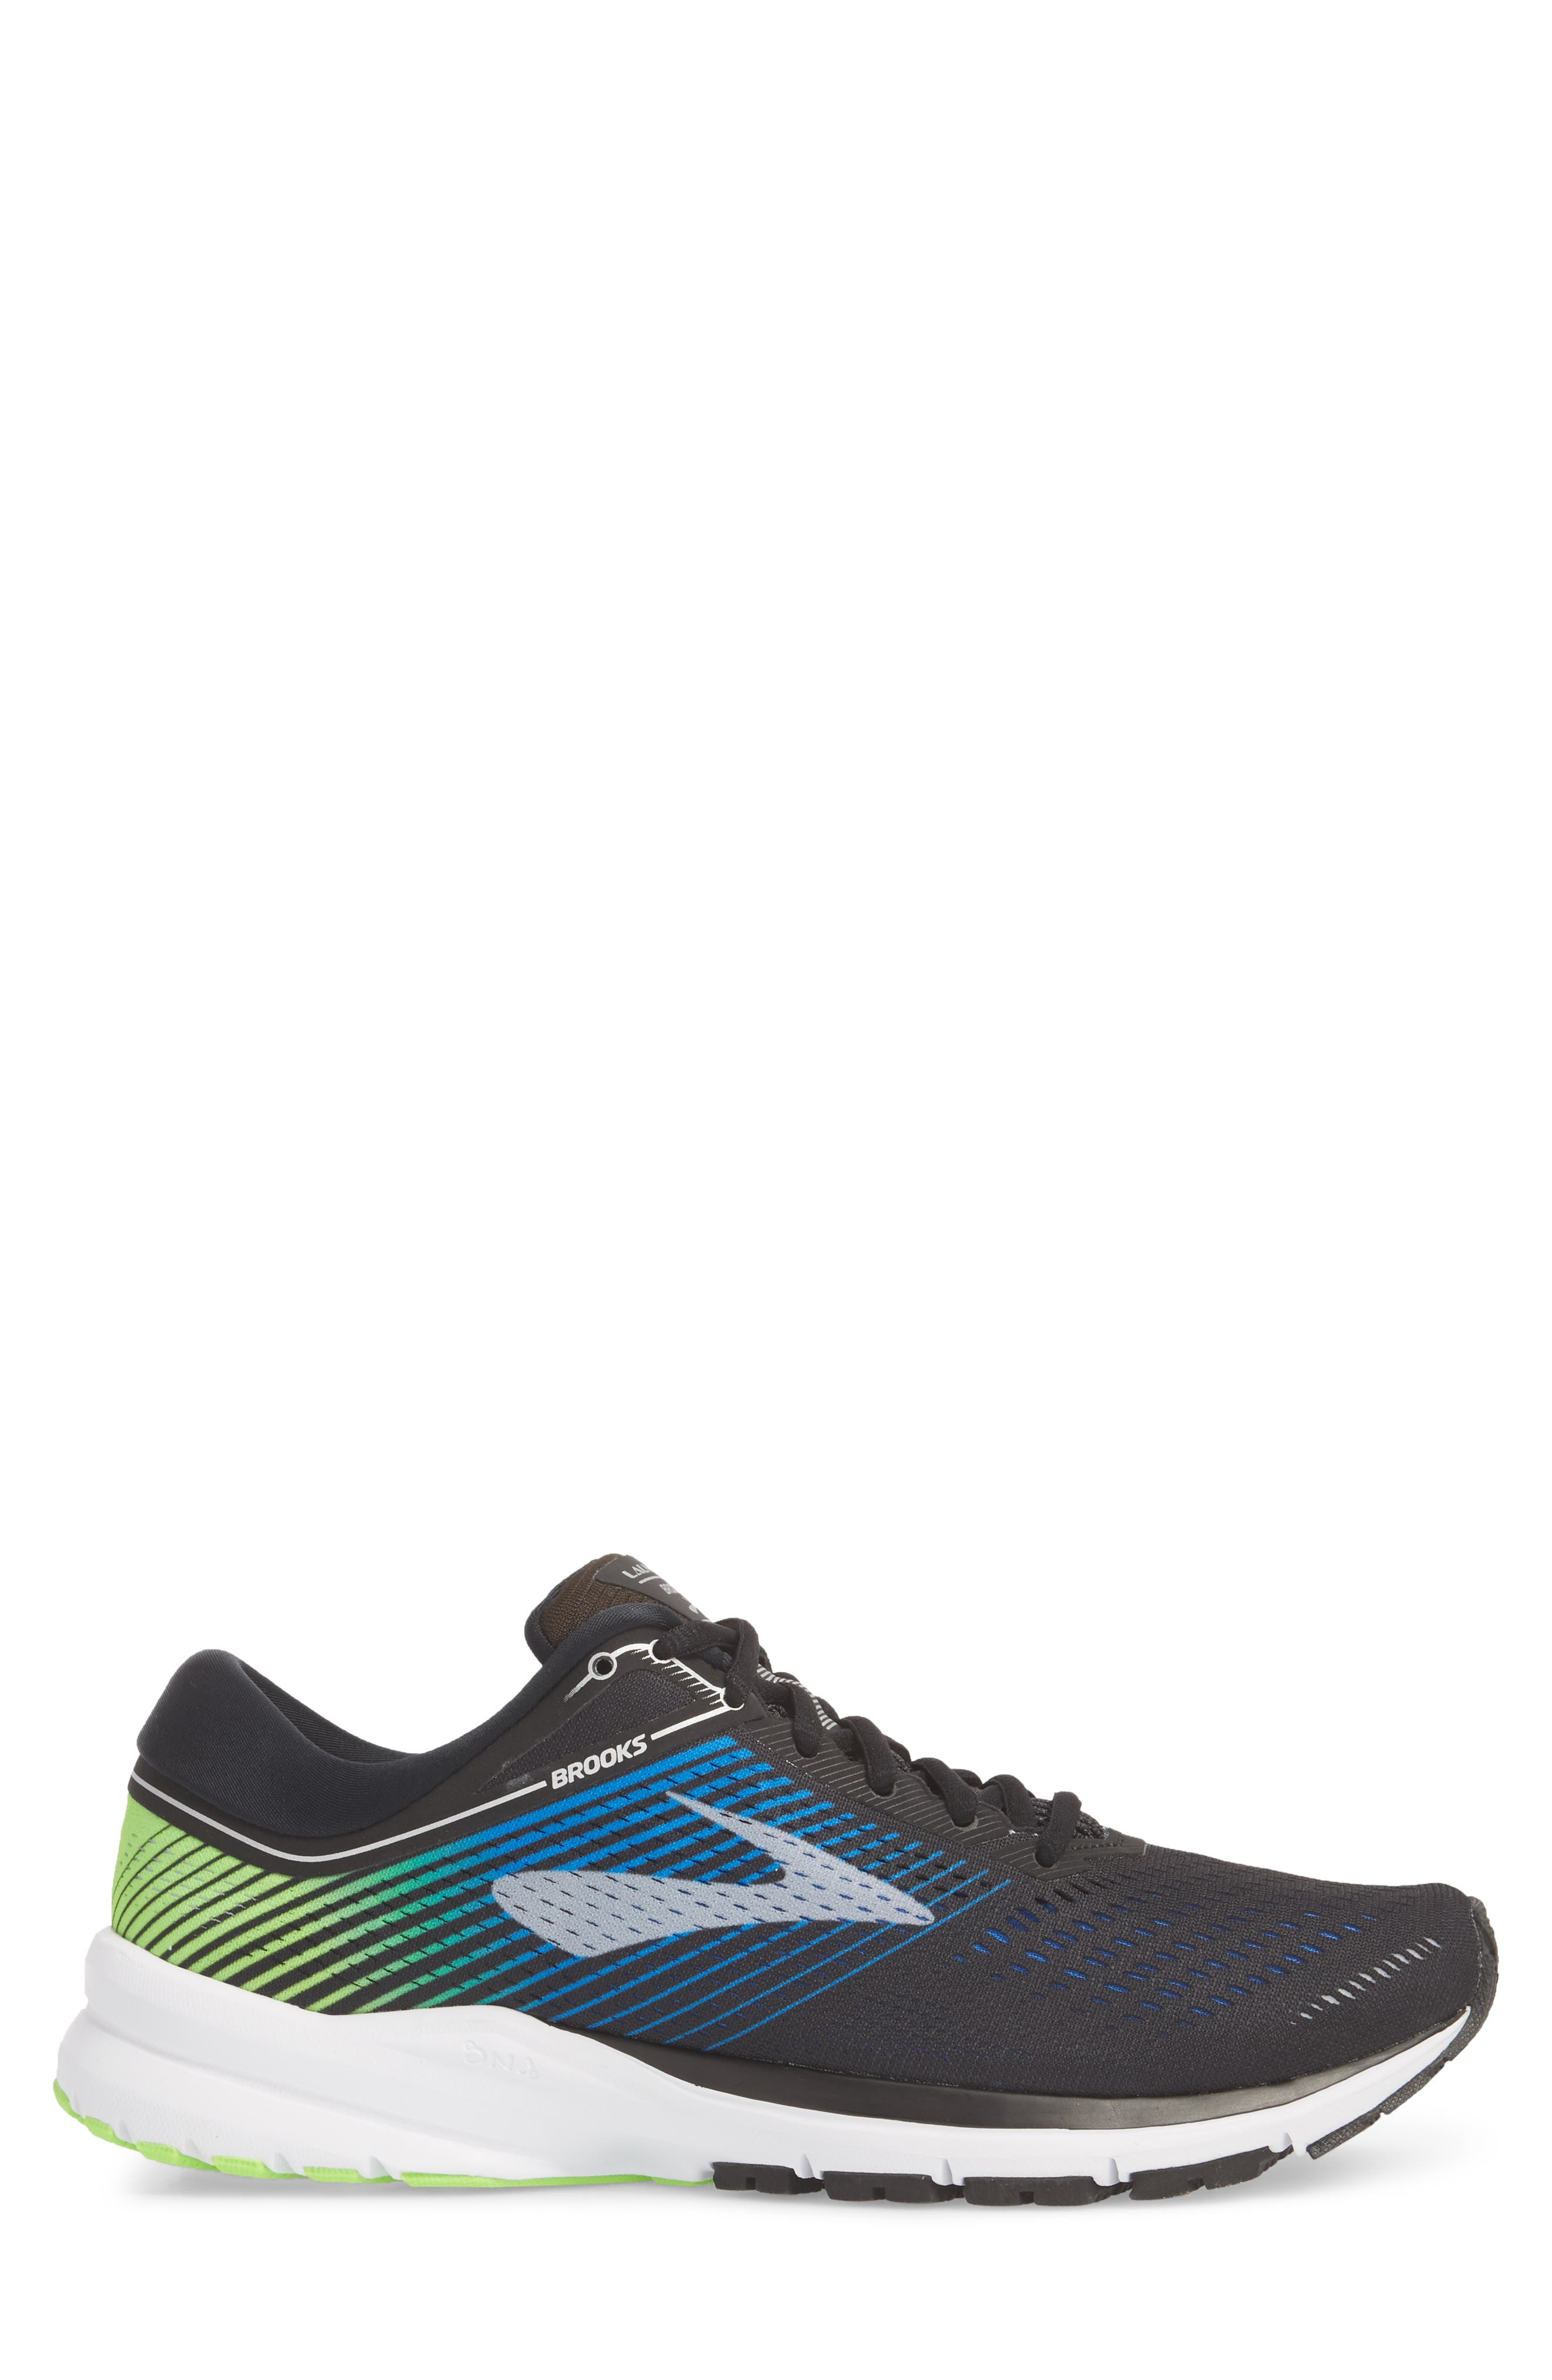 Launch 5 Running Shoe,                             Alternate thumbnail 3, color,                             016